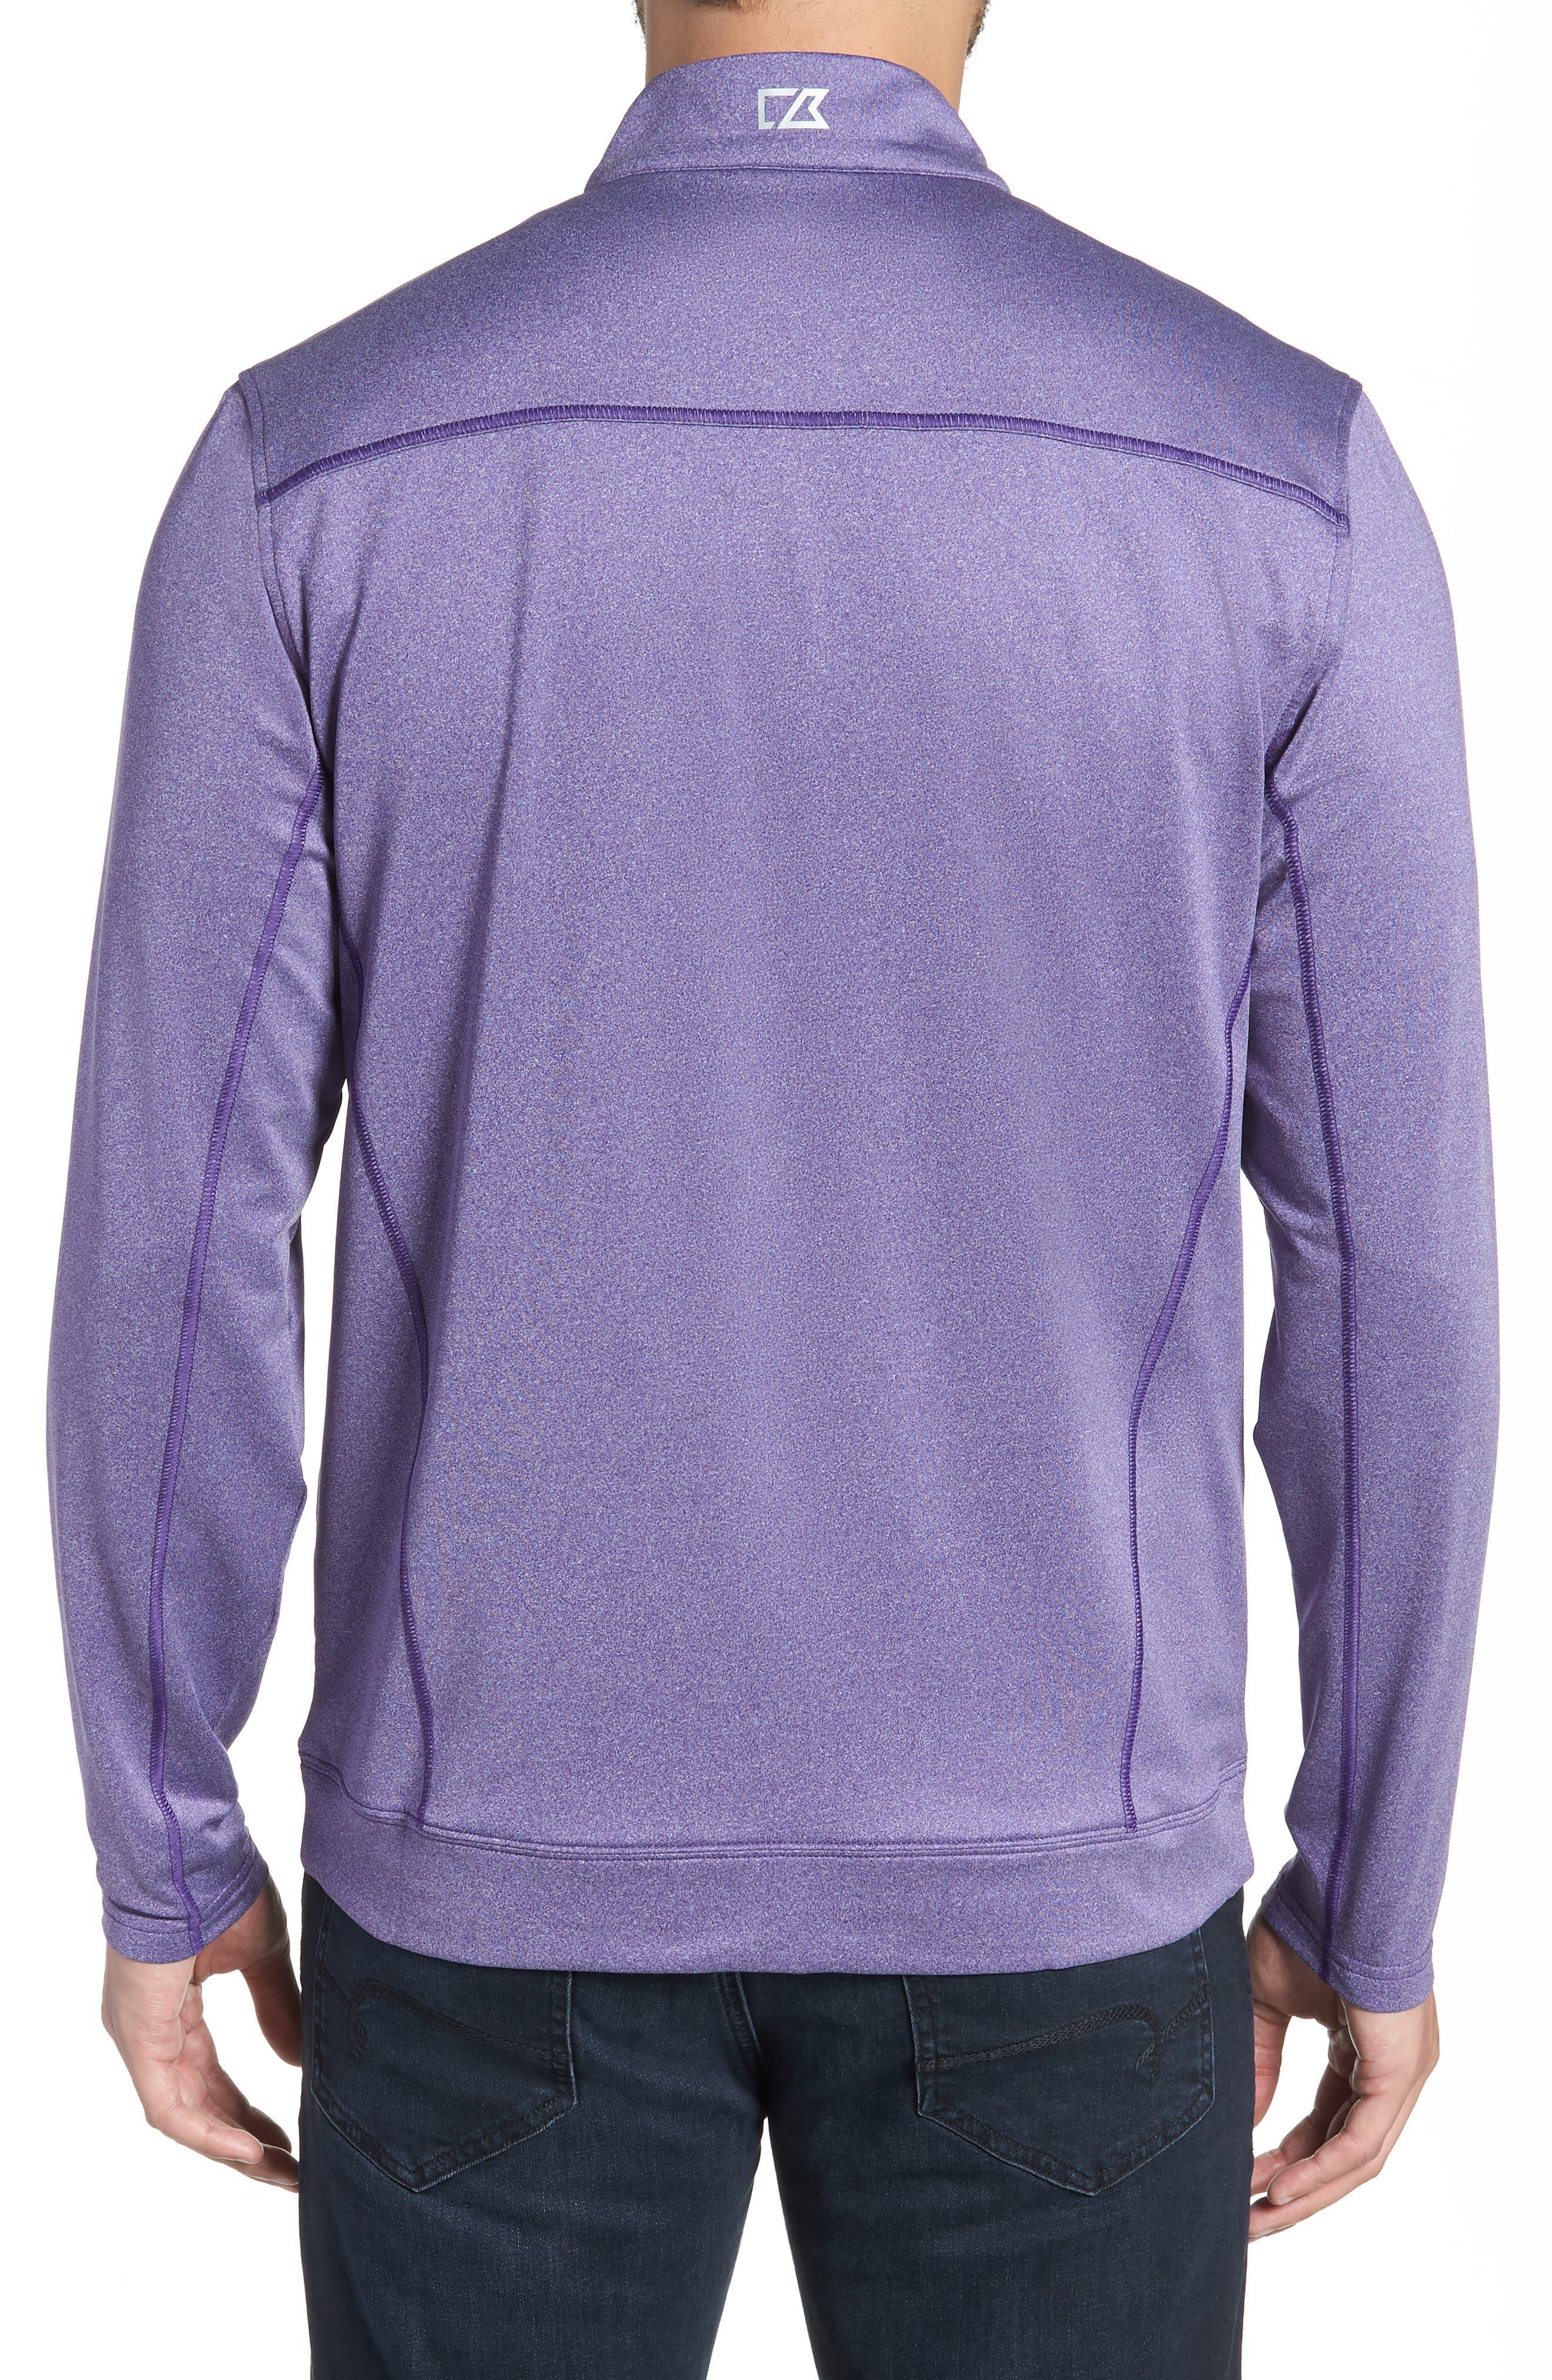 Endurance Minnesota Vikings Regular Fit Pullover,                             Alternate thumbnail 2, color,                             COLLEGE PURPLE HEATHER